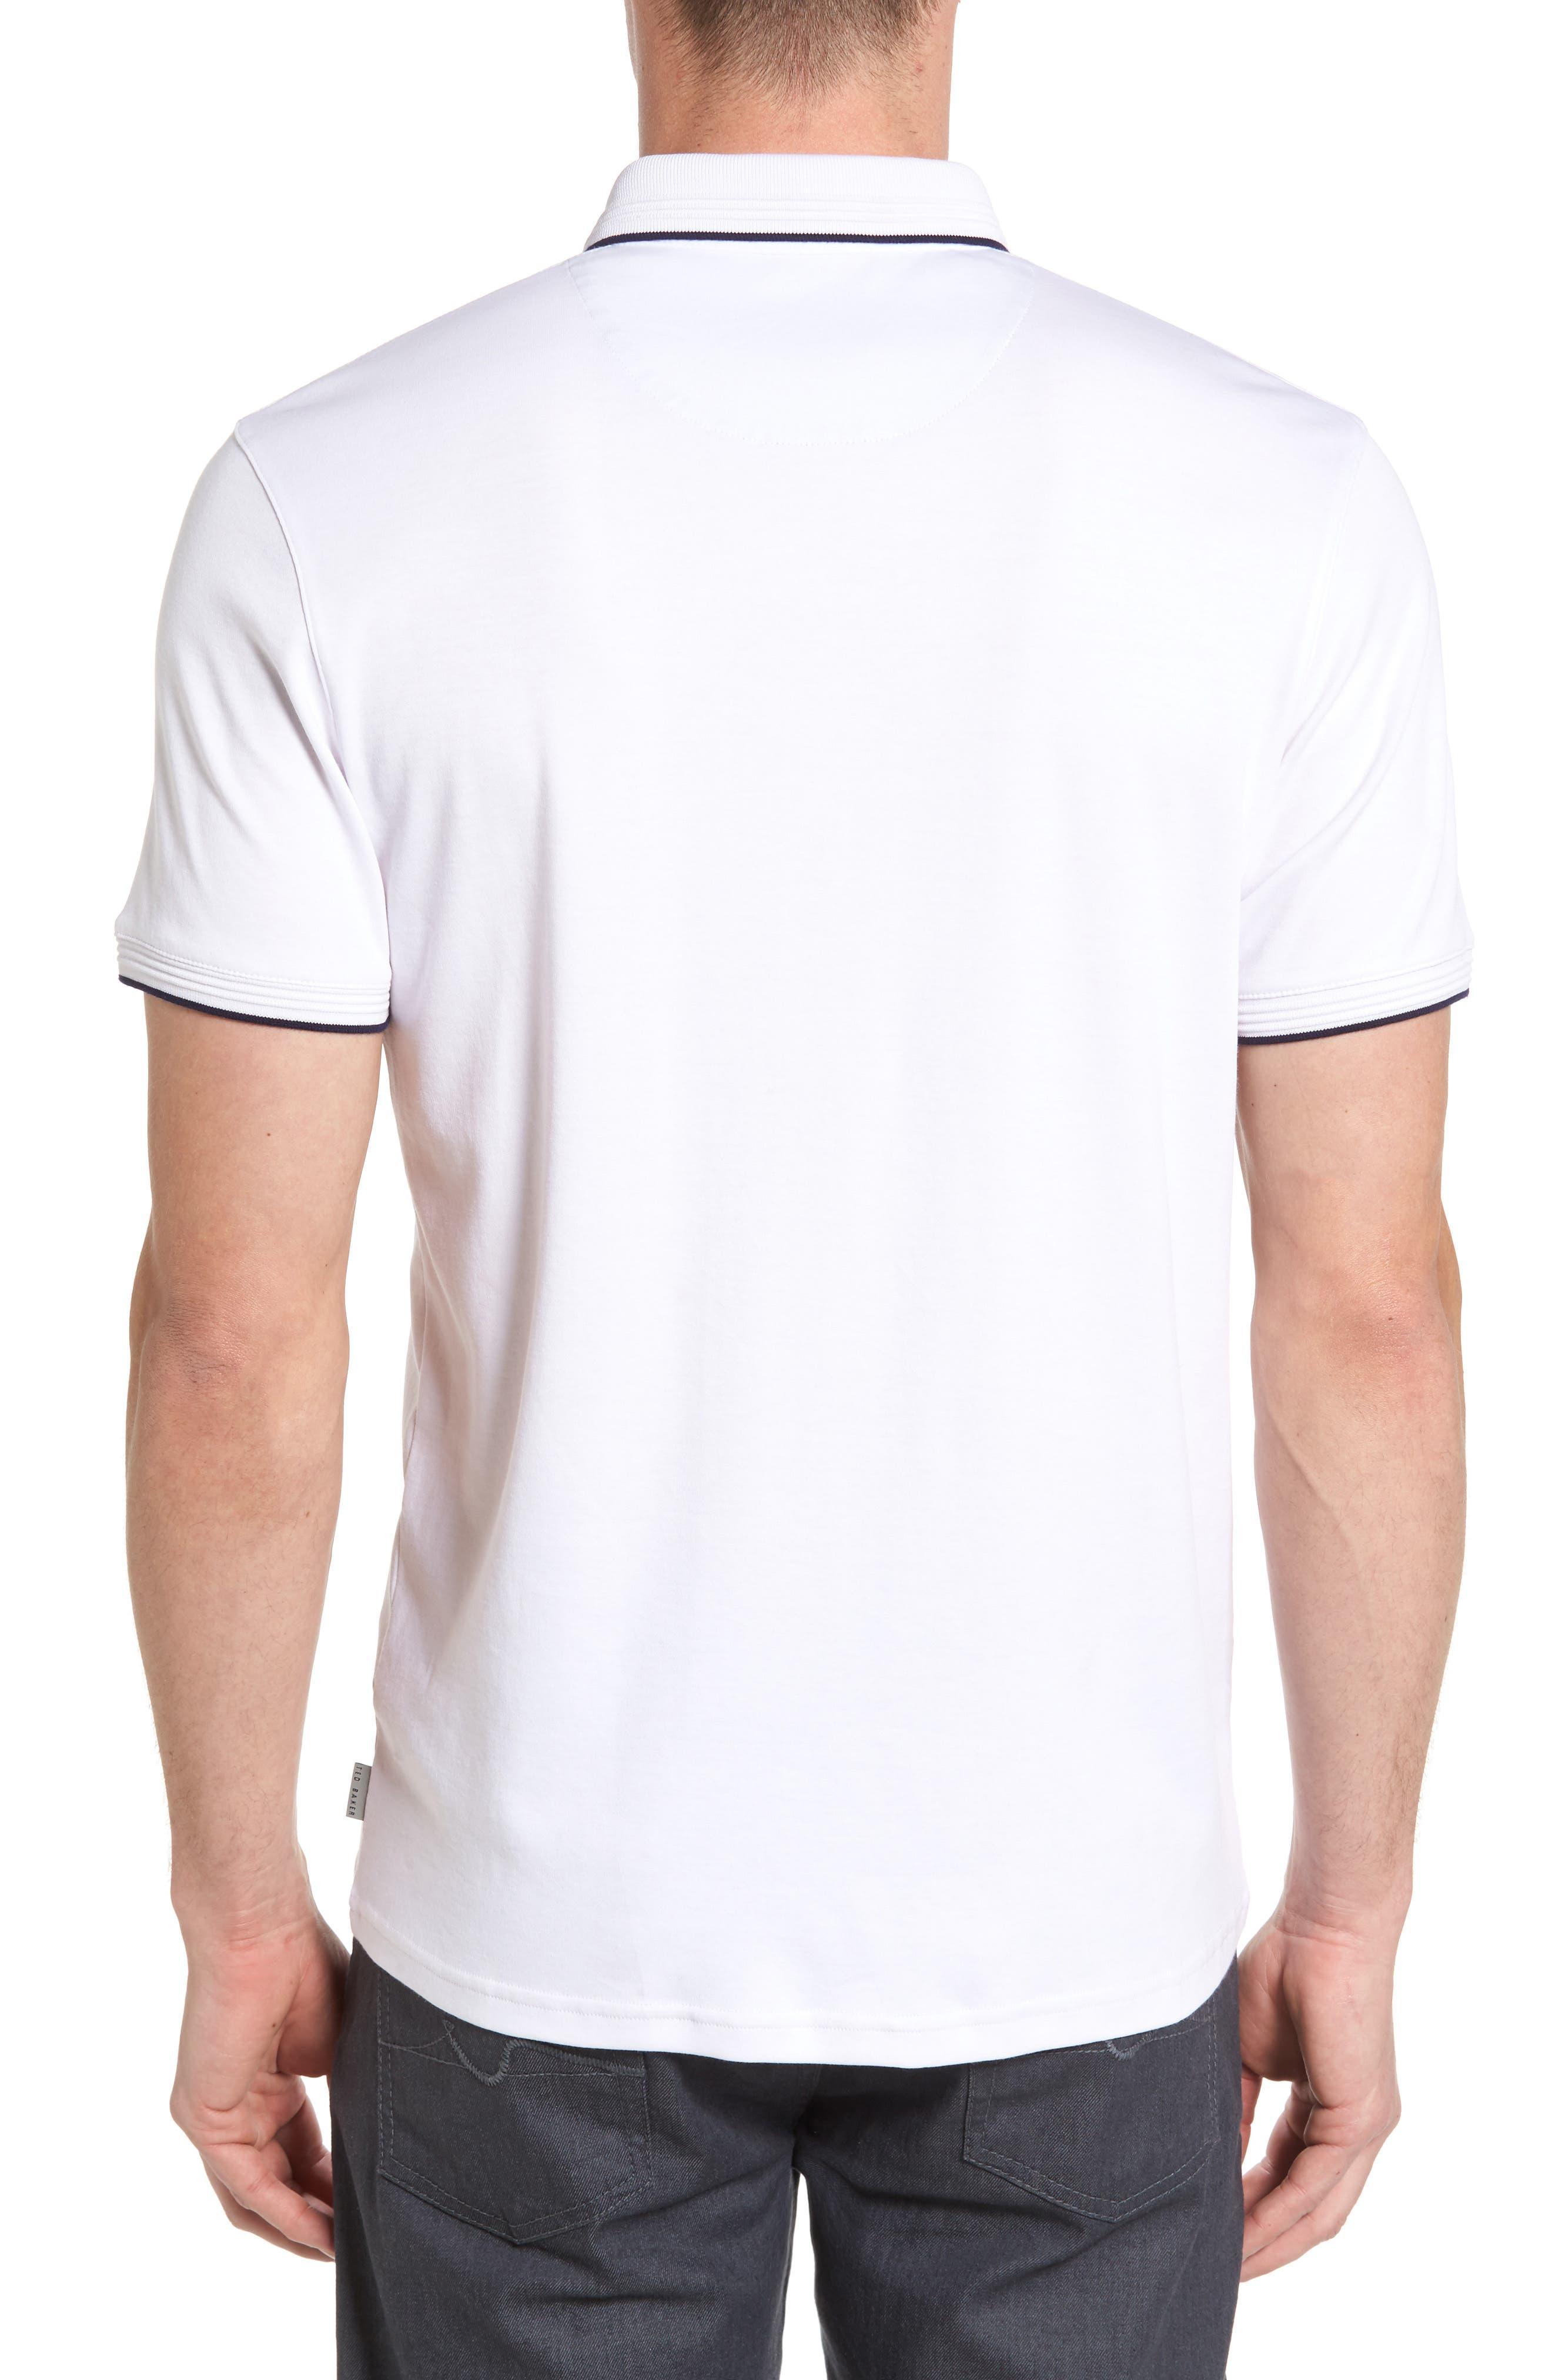 TED BAKER LONDON, Derry Modern Slim Fit Polo, Alternate thumbnail 2, color, WHITE